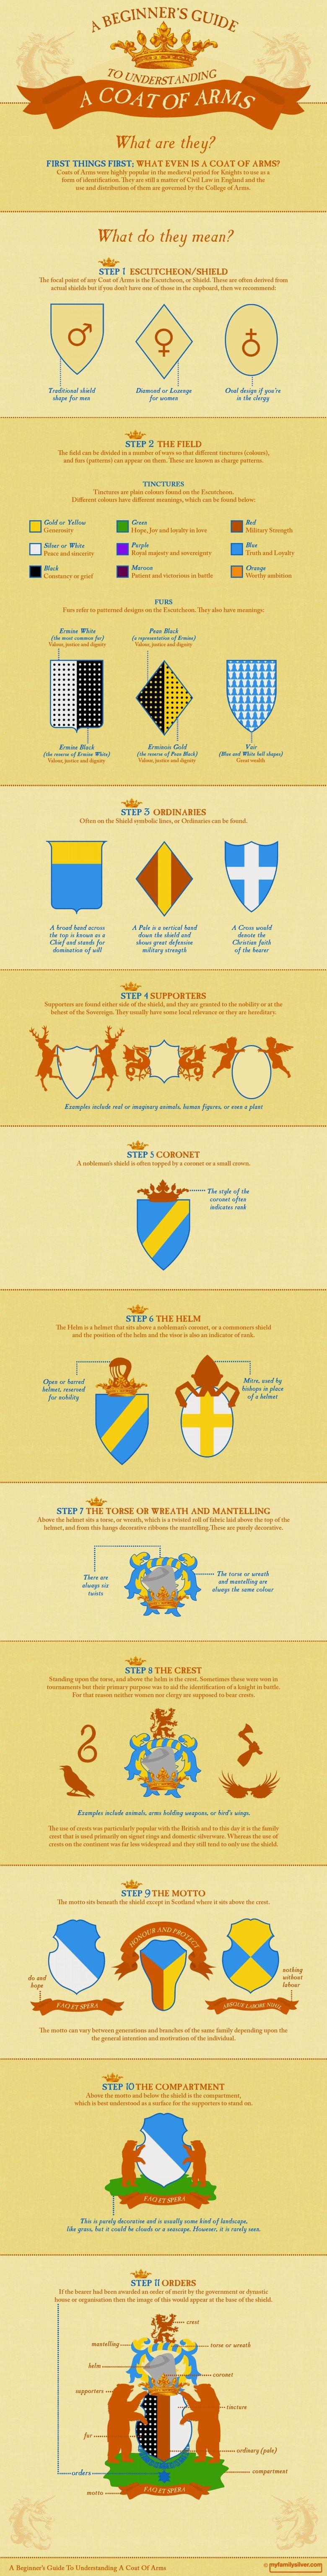 A Beginner's guide to Coat of Arms. .. Representing. Per Mare Per Terras bitches